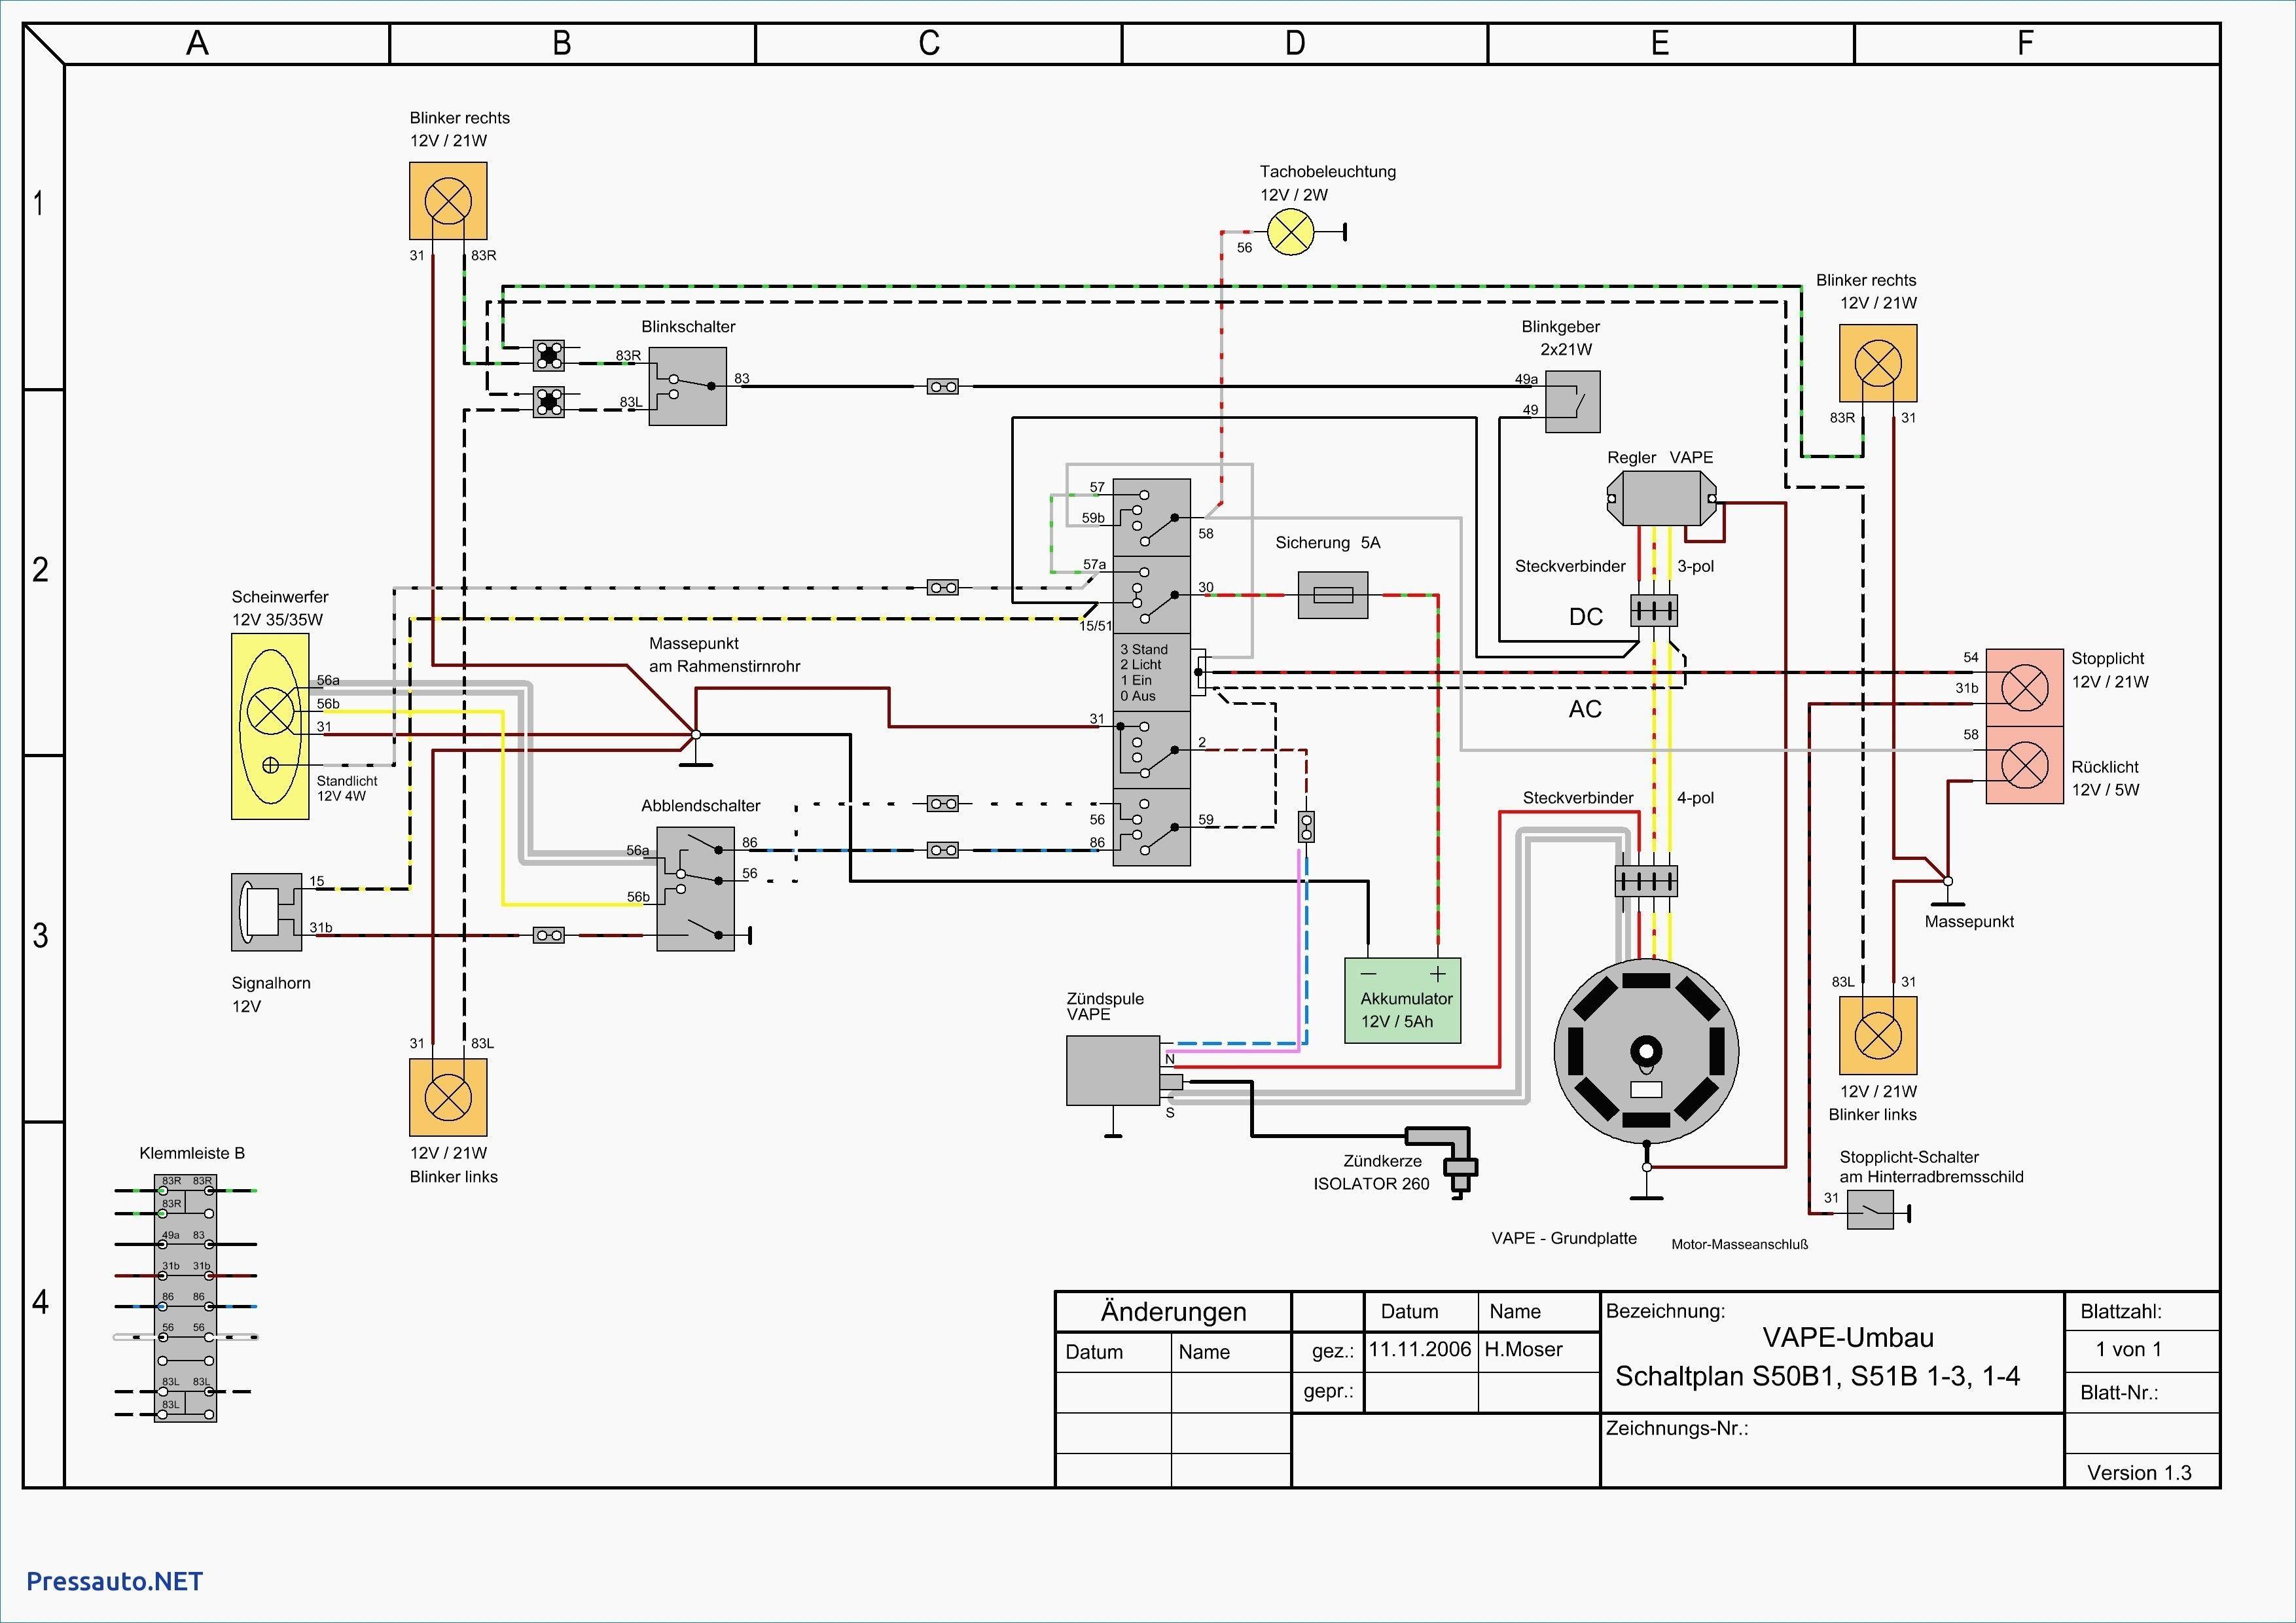 DIAGRAM] Tao 110cc Atv Wiring Diagram FULL Version HD Quality Wiring Diagram  - MOONDIAGRAMS.SKYTG24NEWS.IT | Redcat 110 Atv Wiring Diagram |  | Diagram Database - skytg24news.it